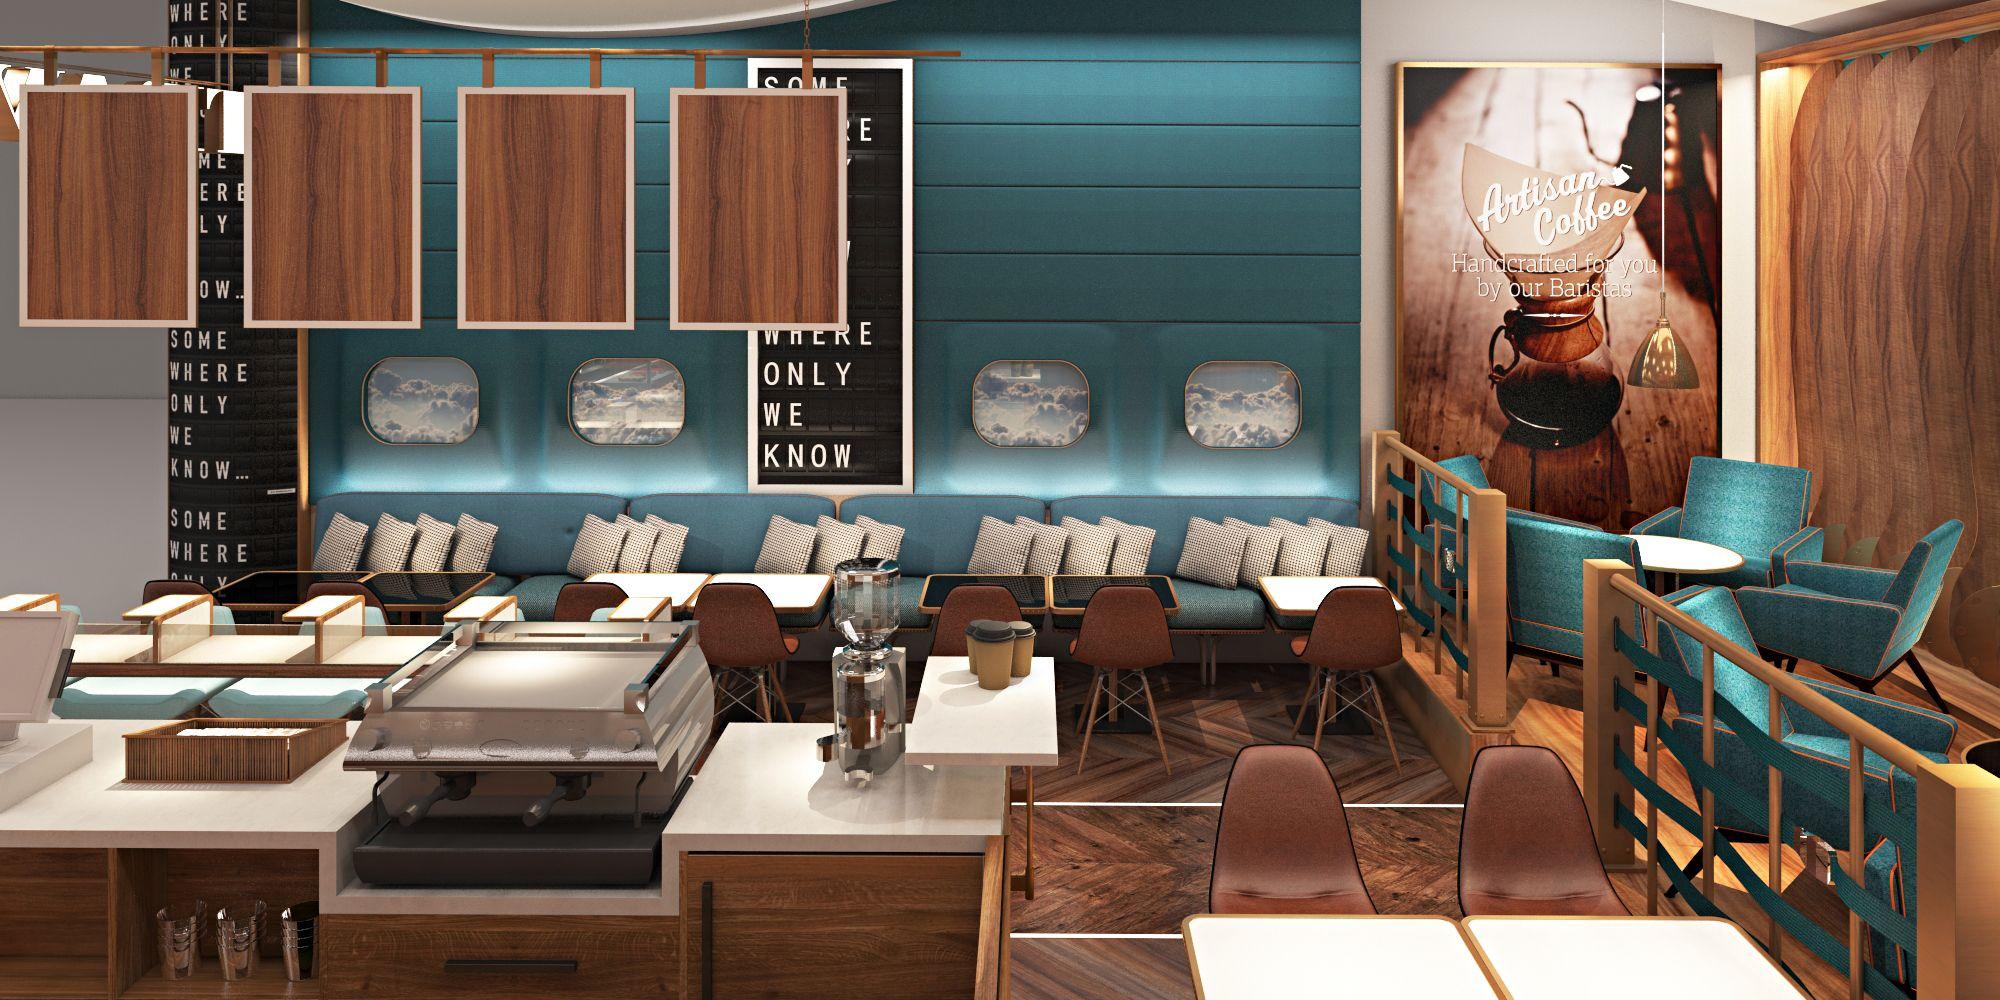 Airport Coffee Shop Design 0